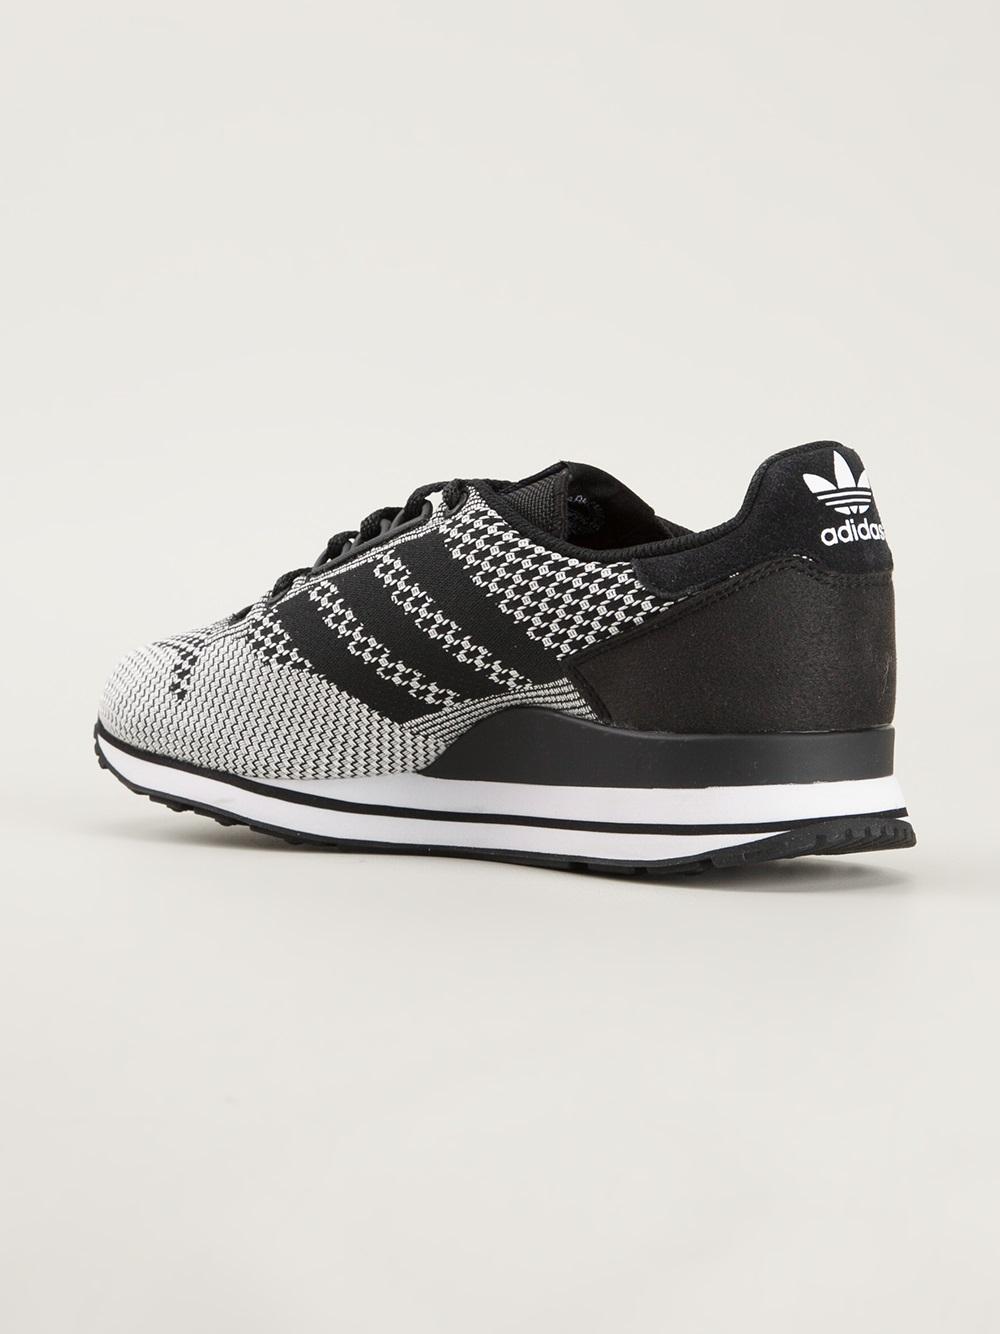 139e685ca Lyst - adidas Zx 500 Og Weave Trainer in Black for Men